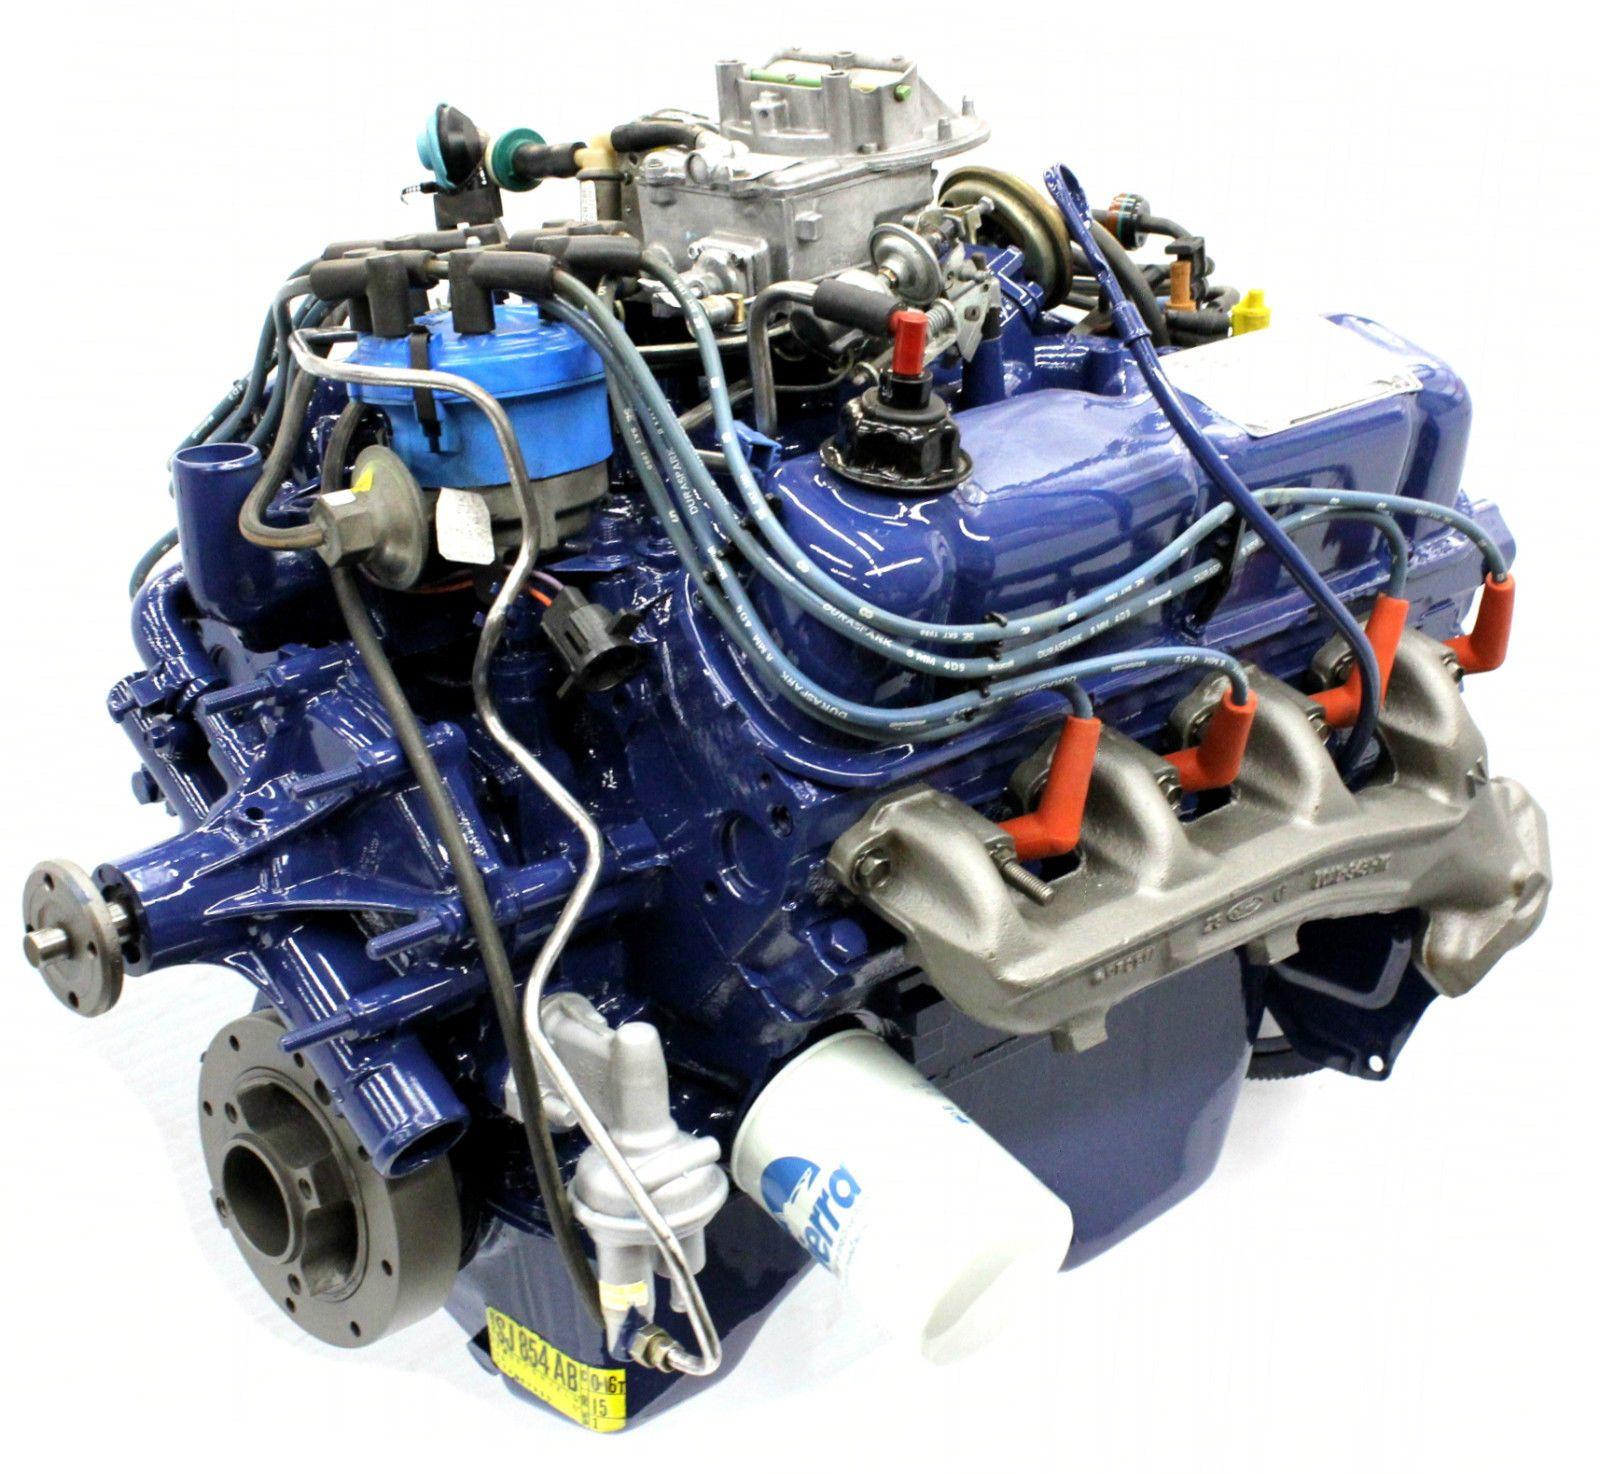 New Ford 255 4 2l V8 Complete Engine Motor 2v 1980 82 Fairmont Mustang Mercury Ebay Ford Engineering Motor